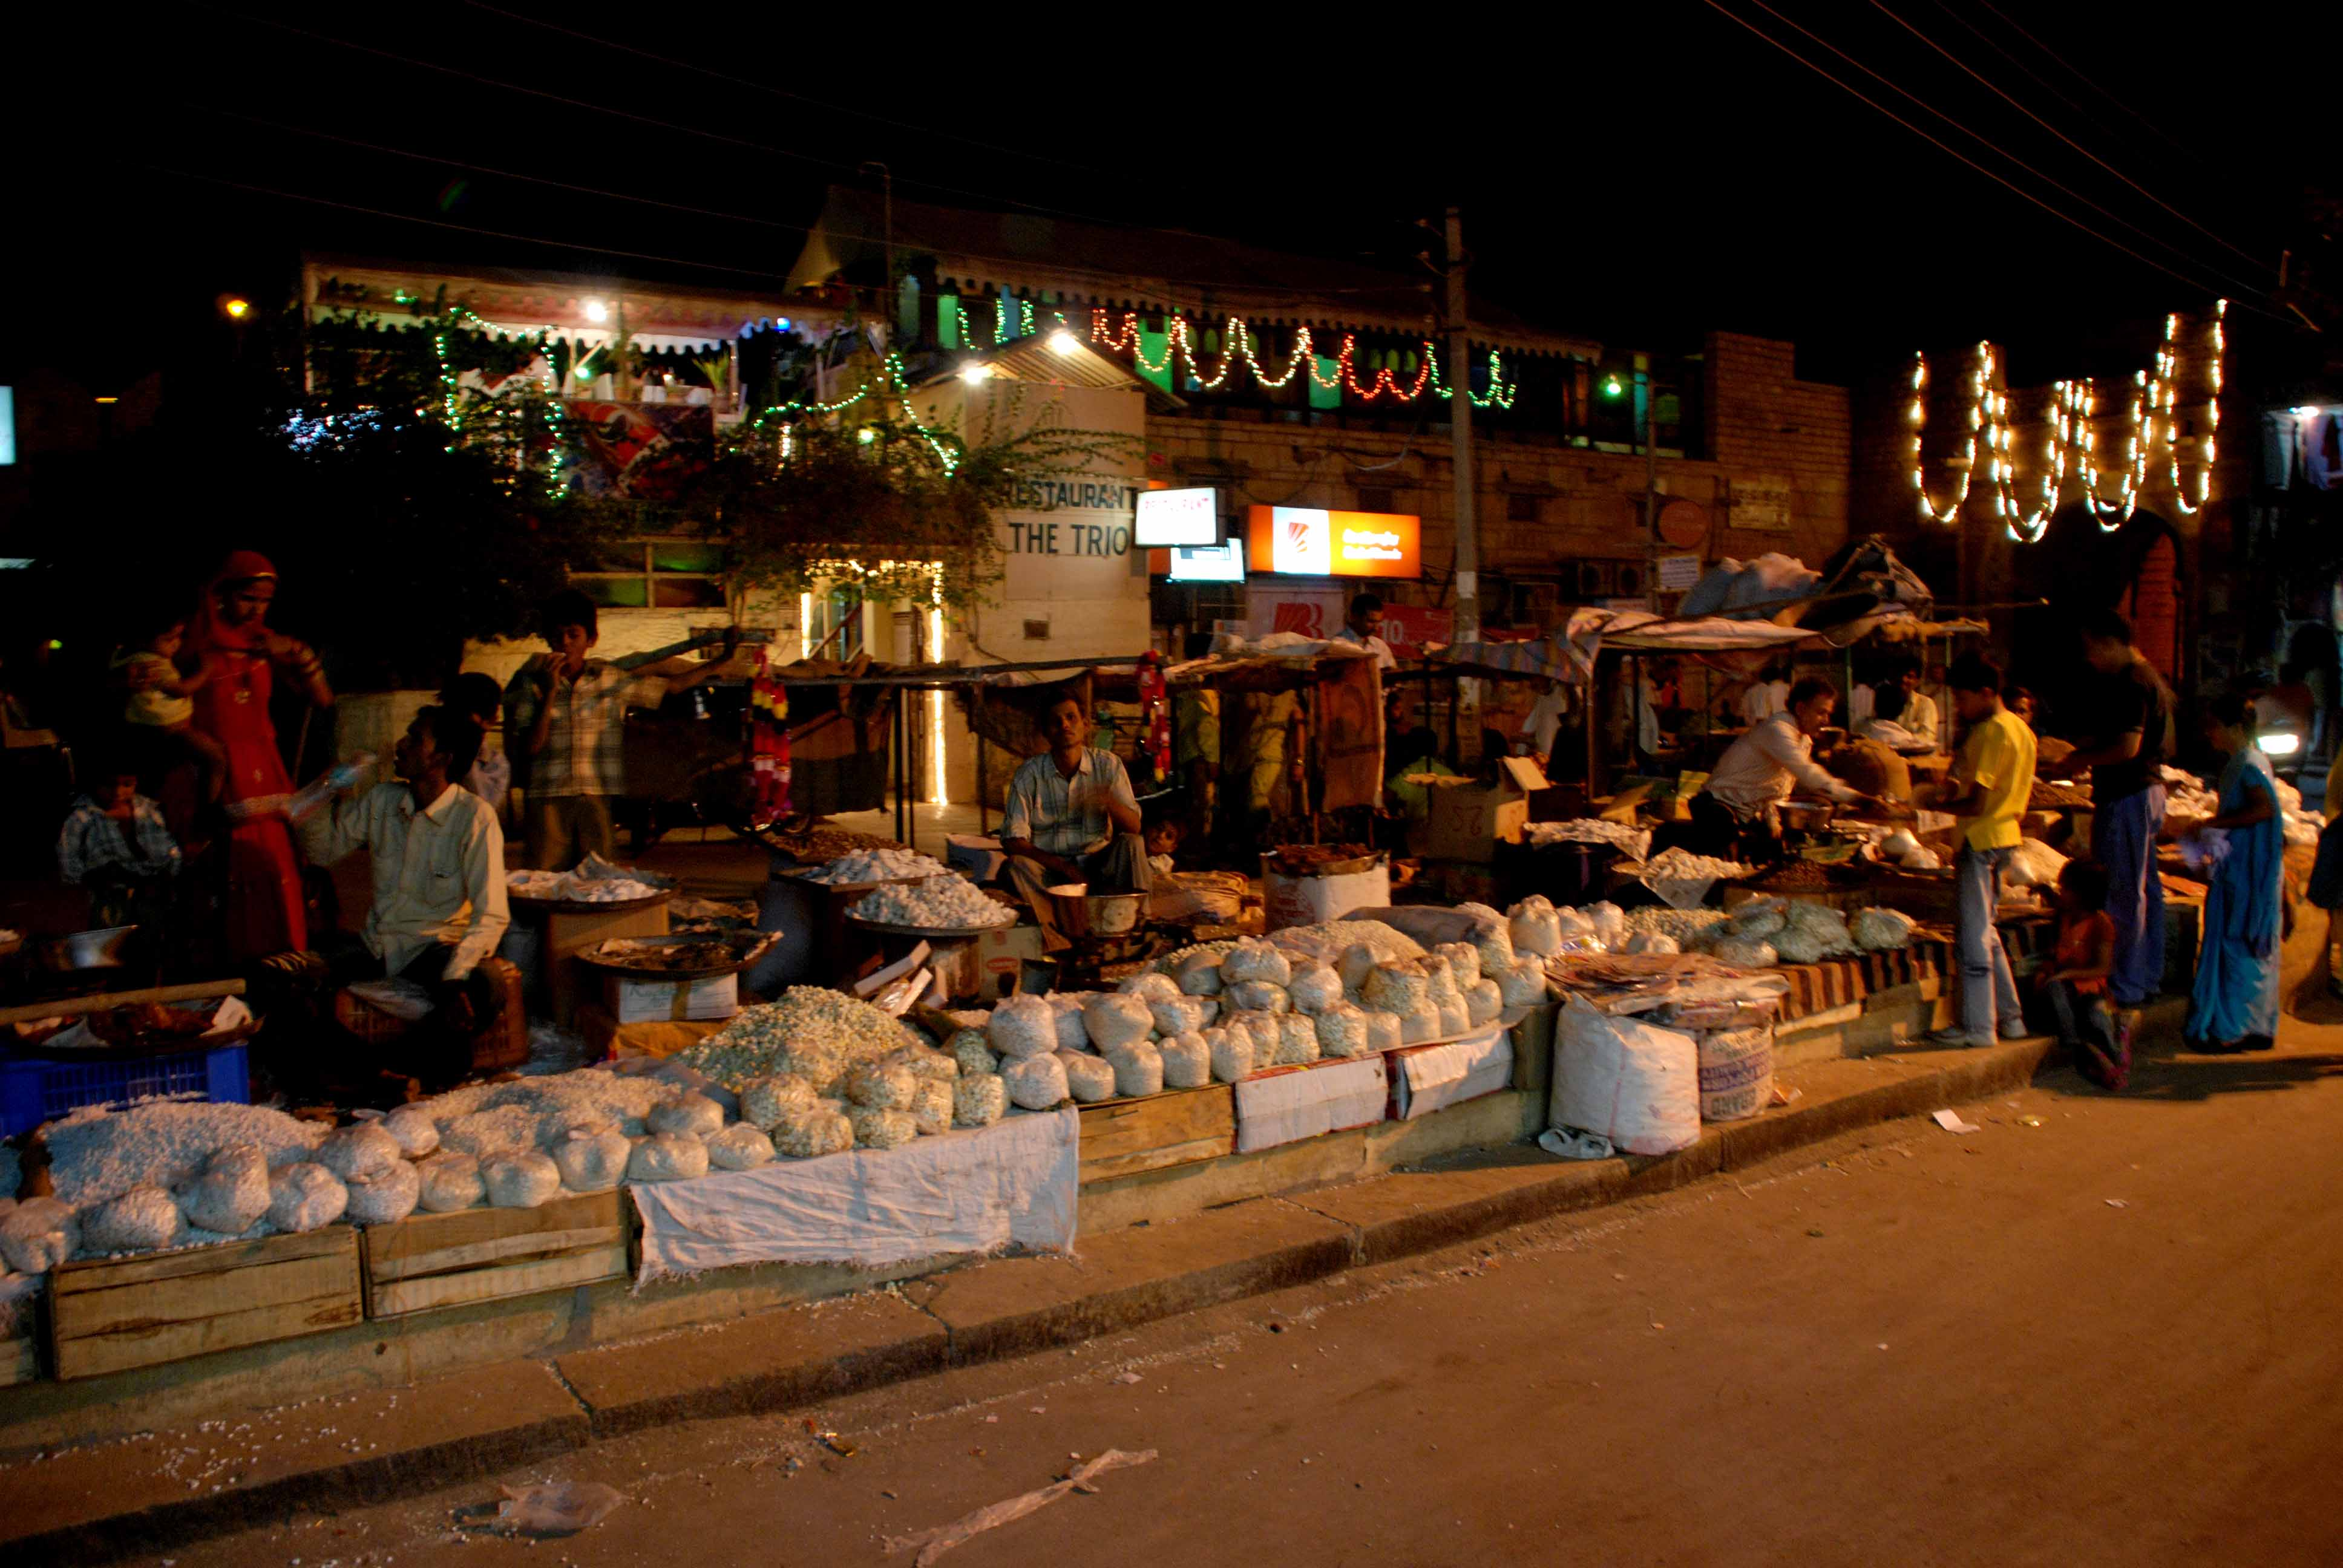 The streets of Jaisalmer